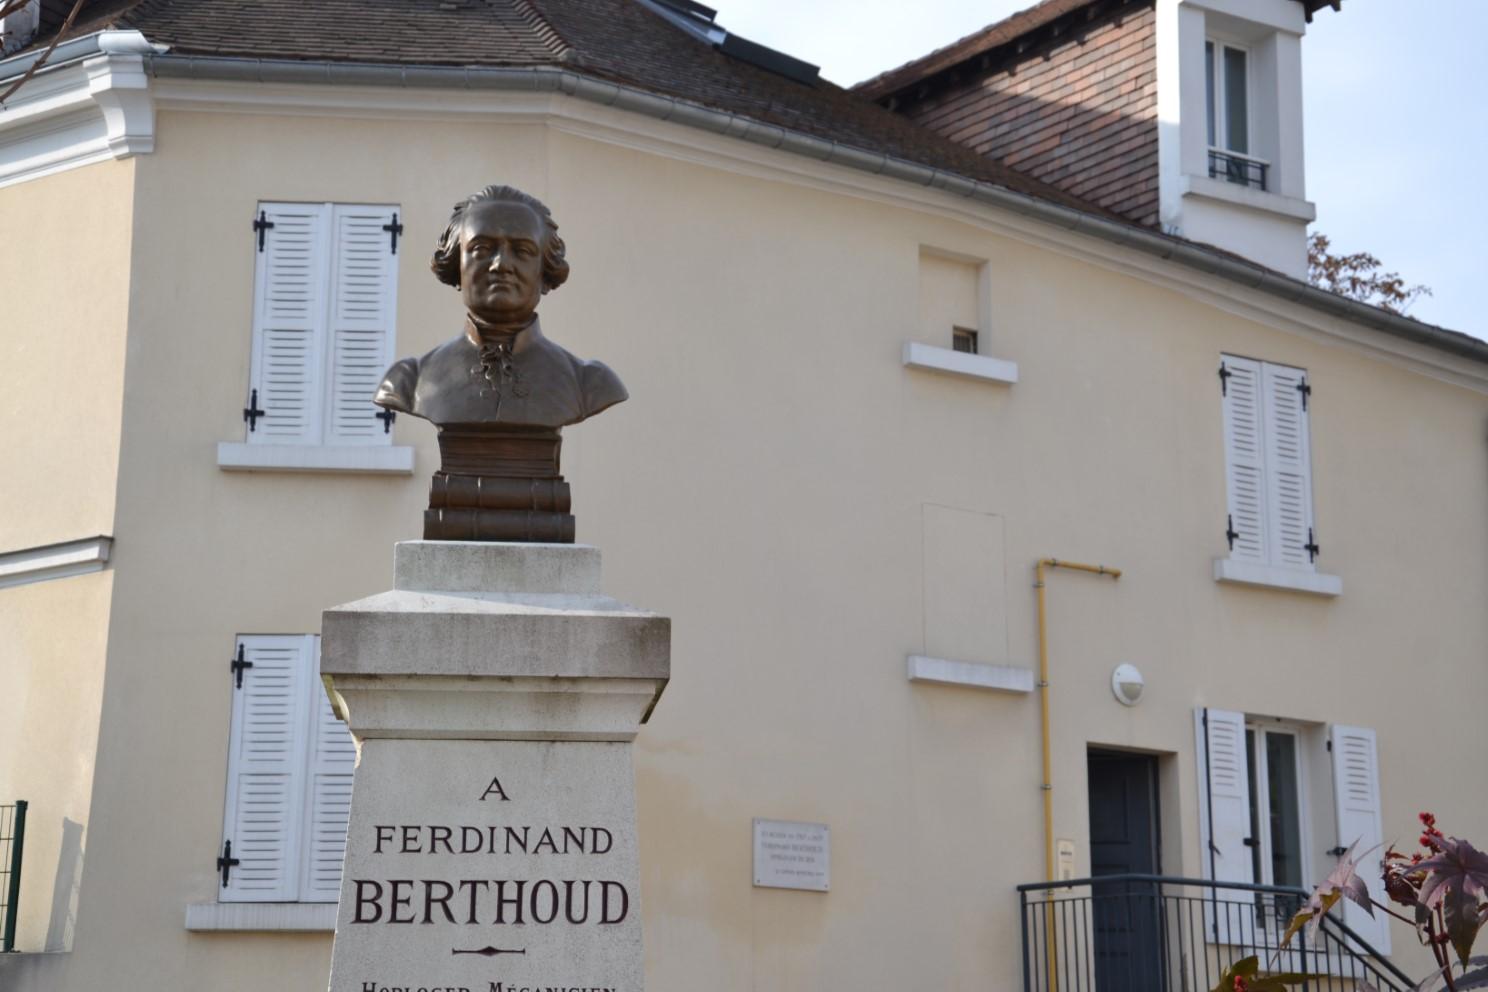 Maison de Ferdinand Berthoud